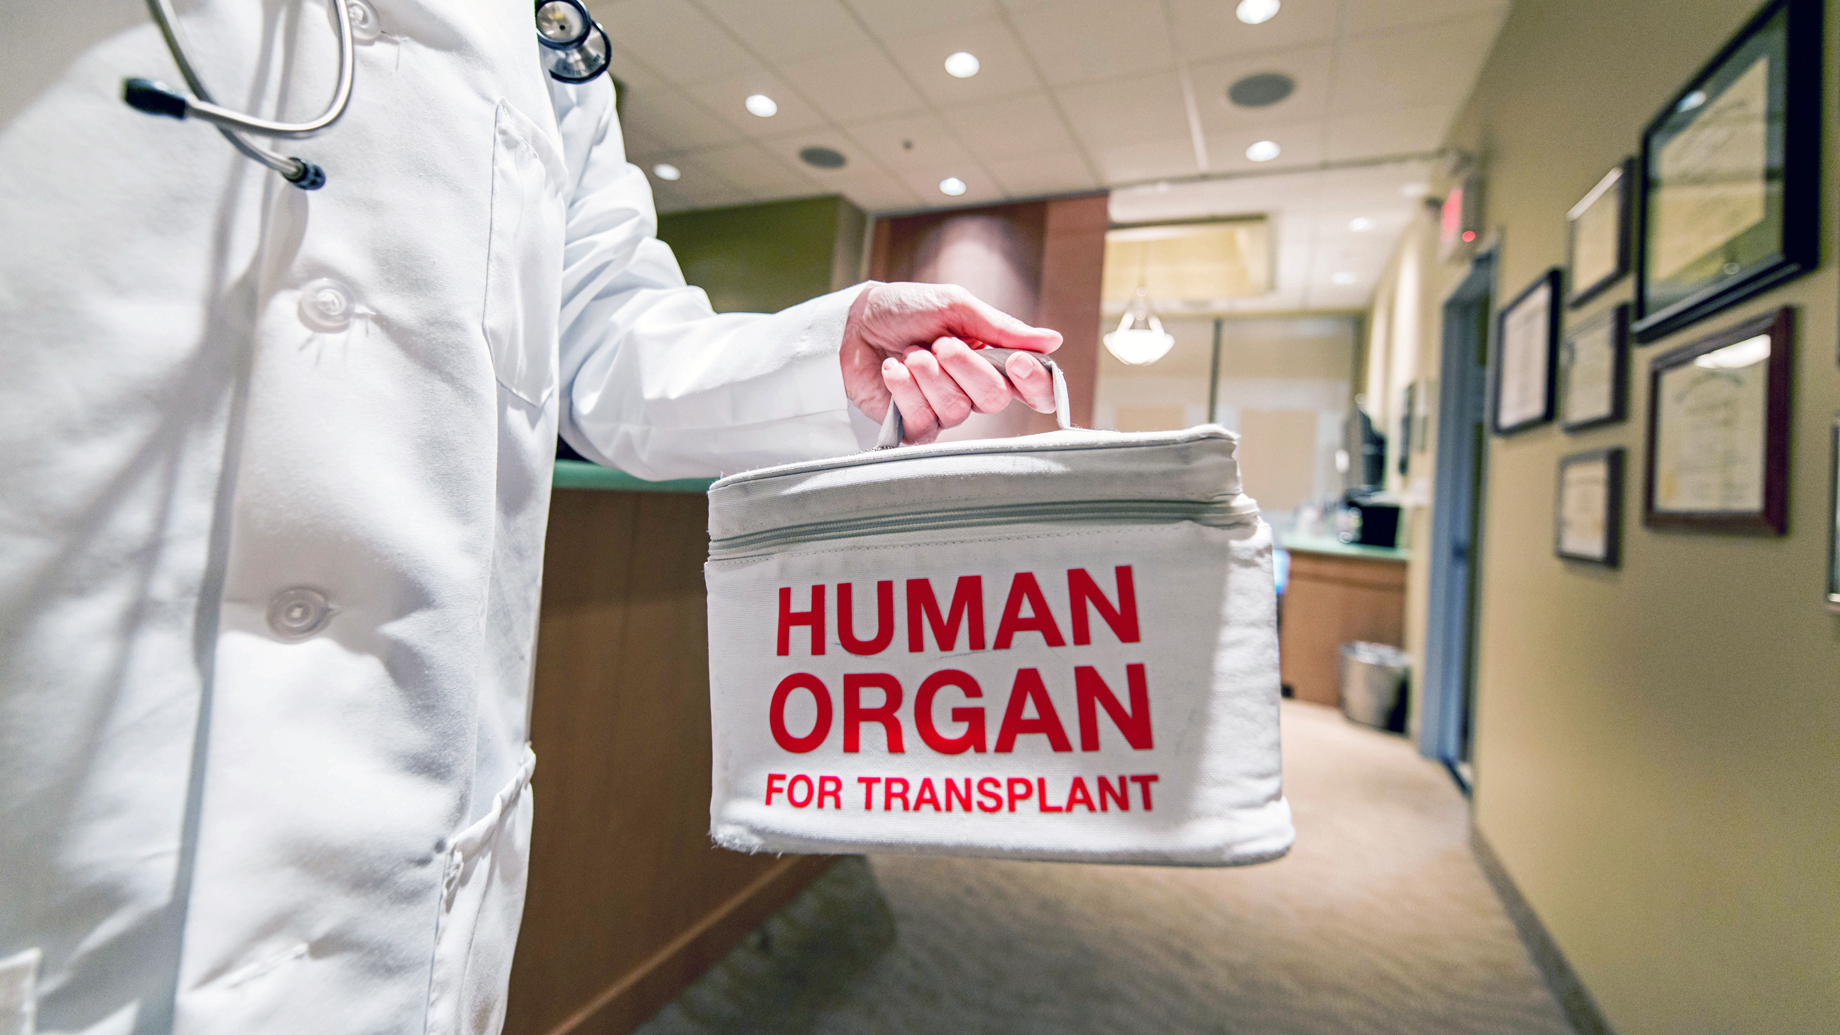 A doctor holding an organ donation bag